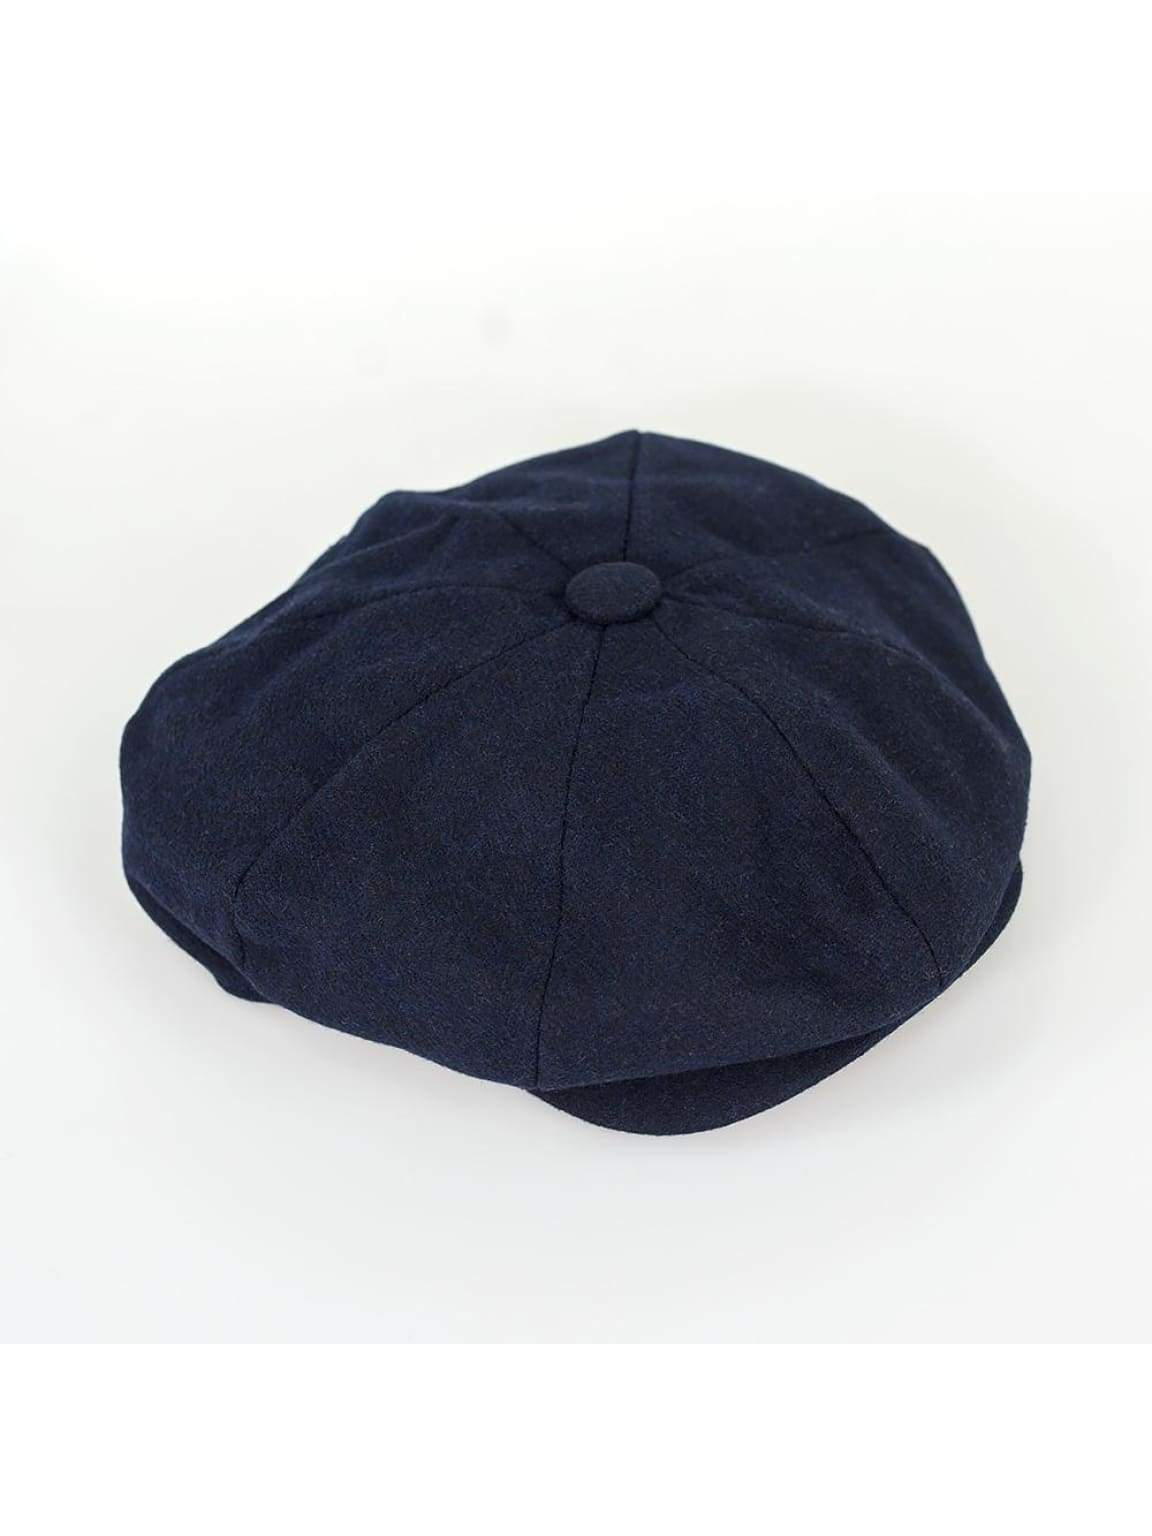 Cavani Kyra Navy Baker Boy Style Flat Cap - S/M - Accessories